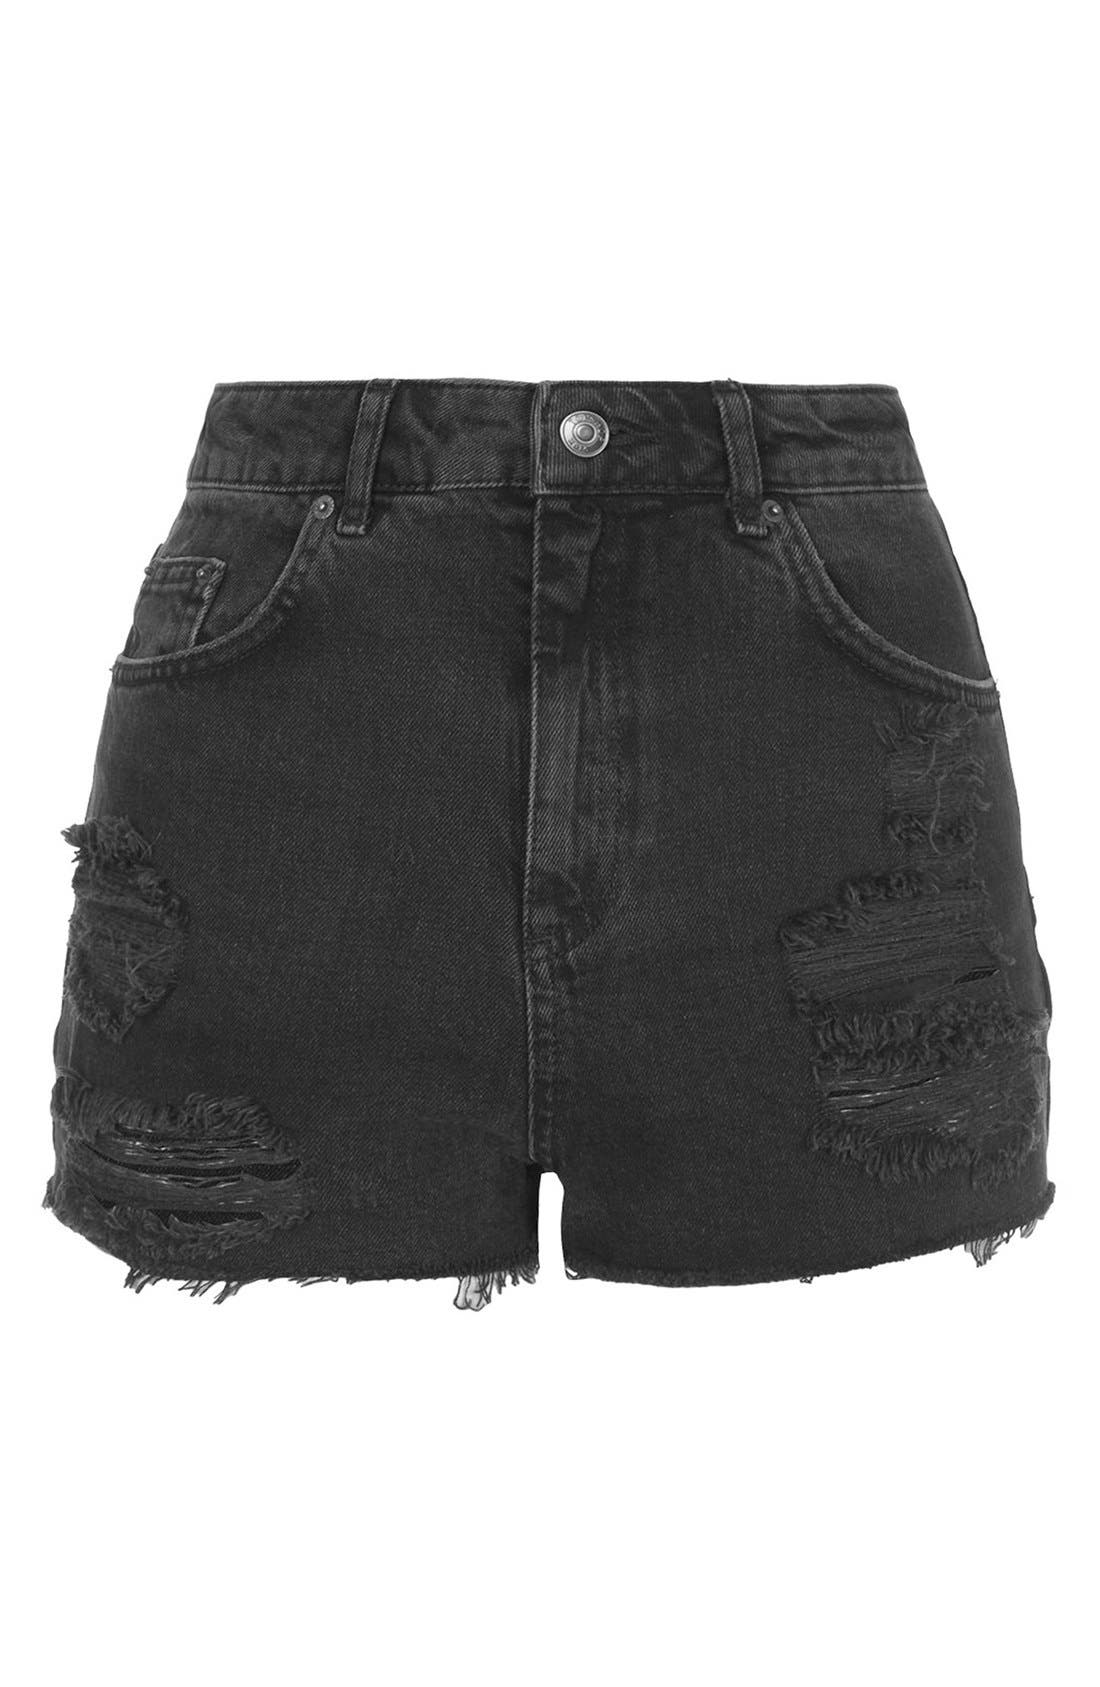 Alternate Image 3  - Topshop Moto Ripped Shorts (Black)